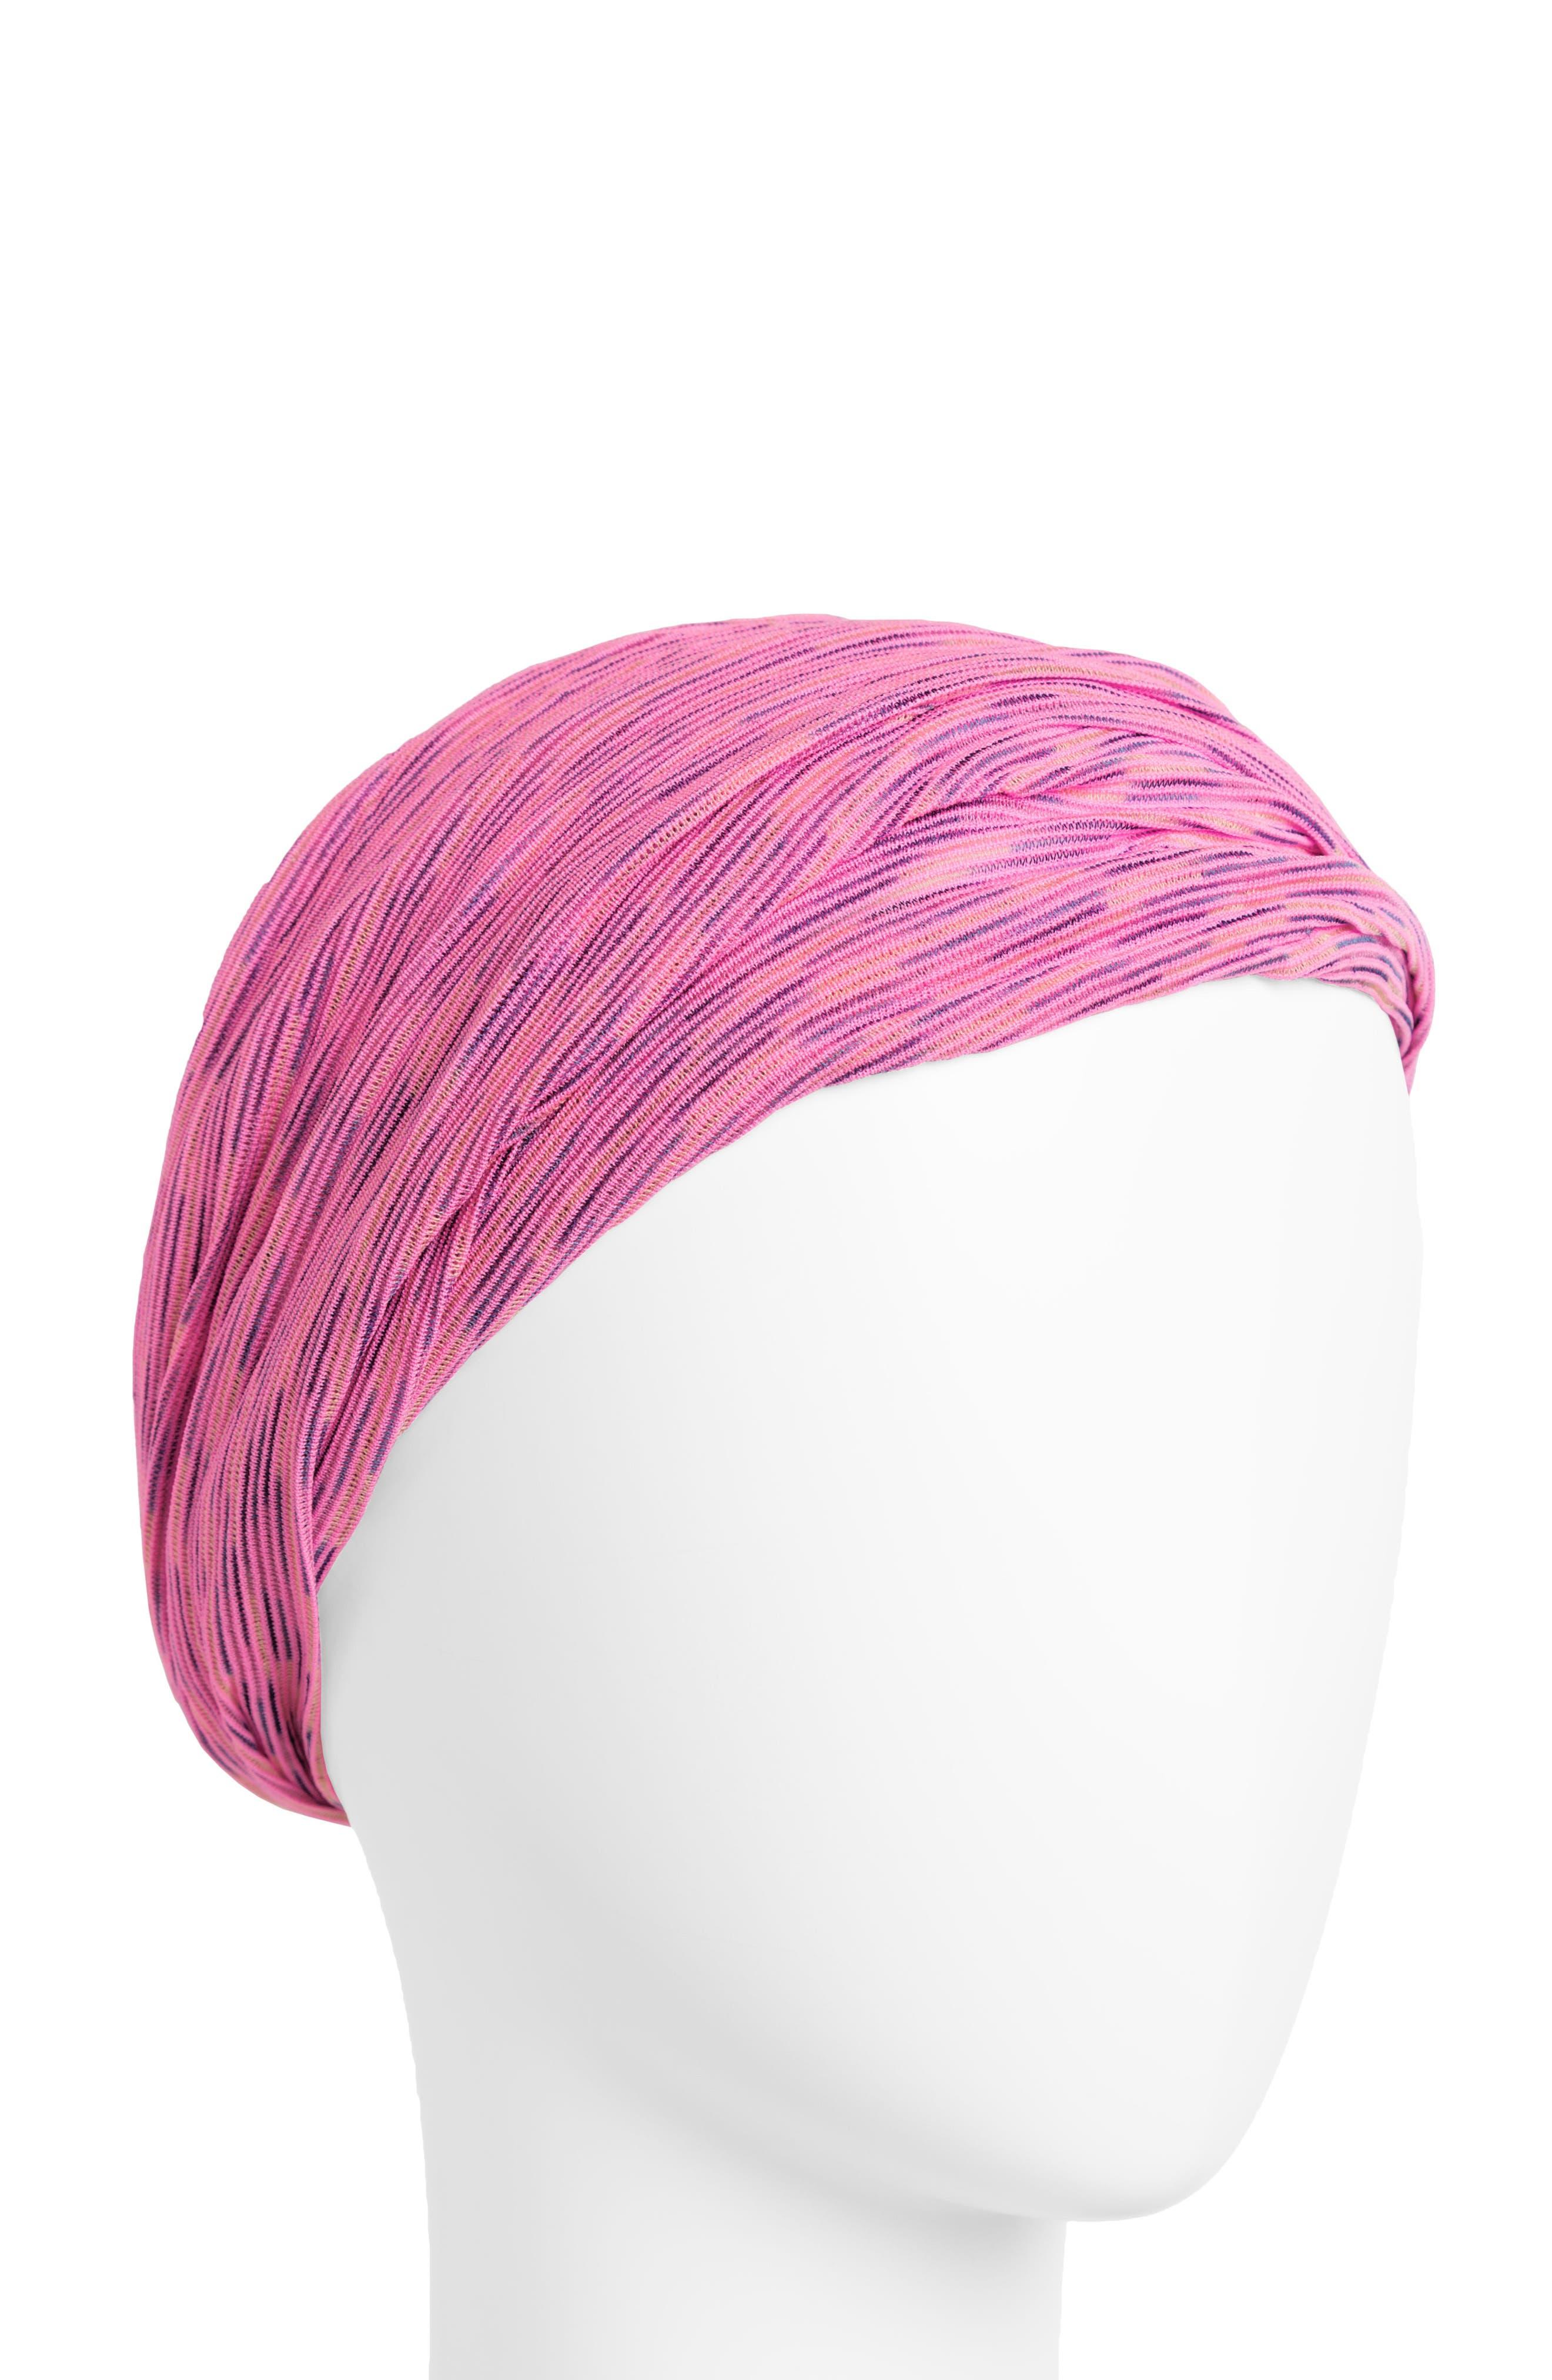 L. Erickson Space Dye Relaxed Turban Head Wrap